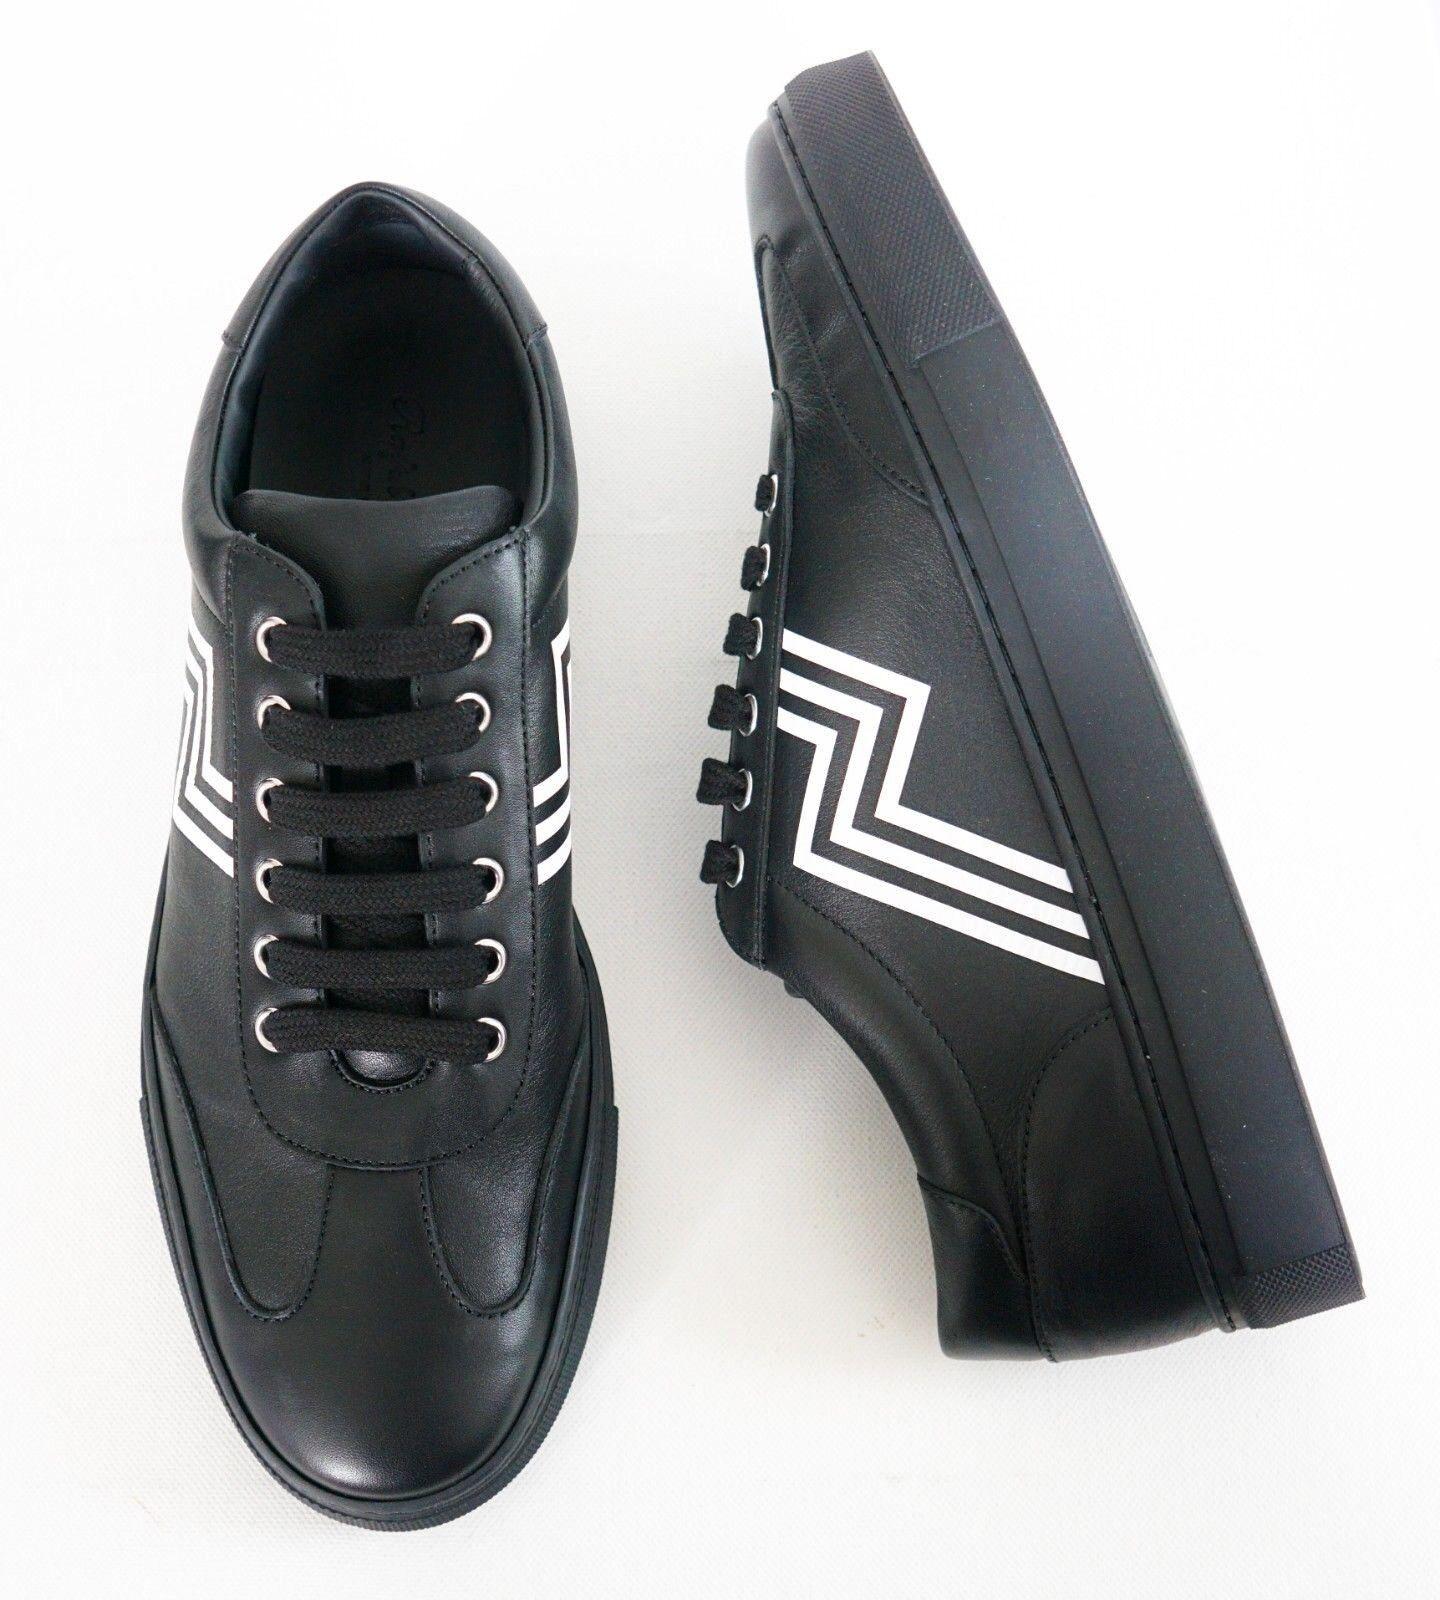 RALPH LAUREN PURPLE LABEL Black Leather LOW-TOP Fashion Sneakers EUR-43 US-10